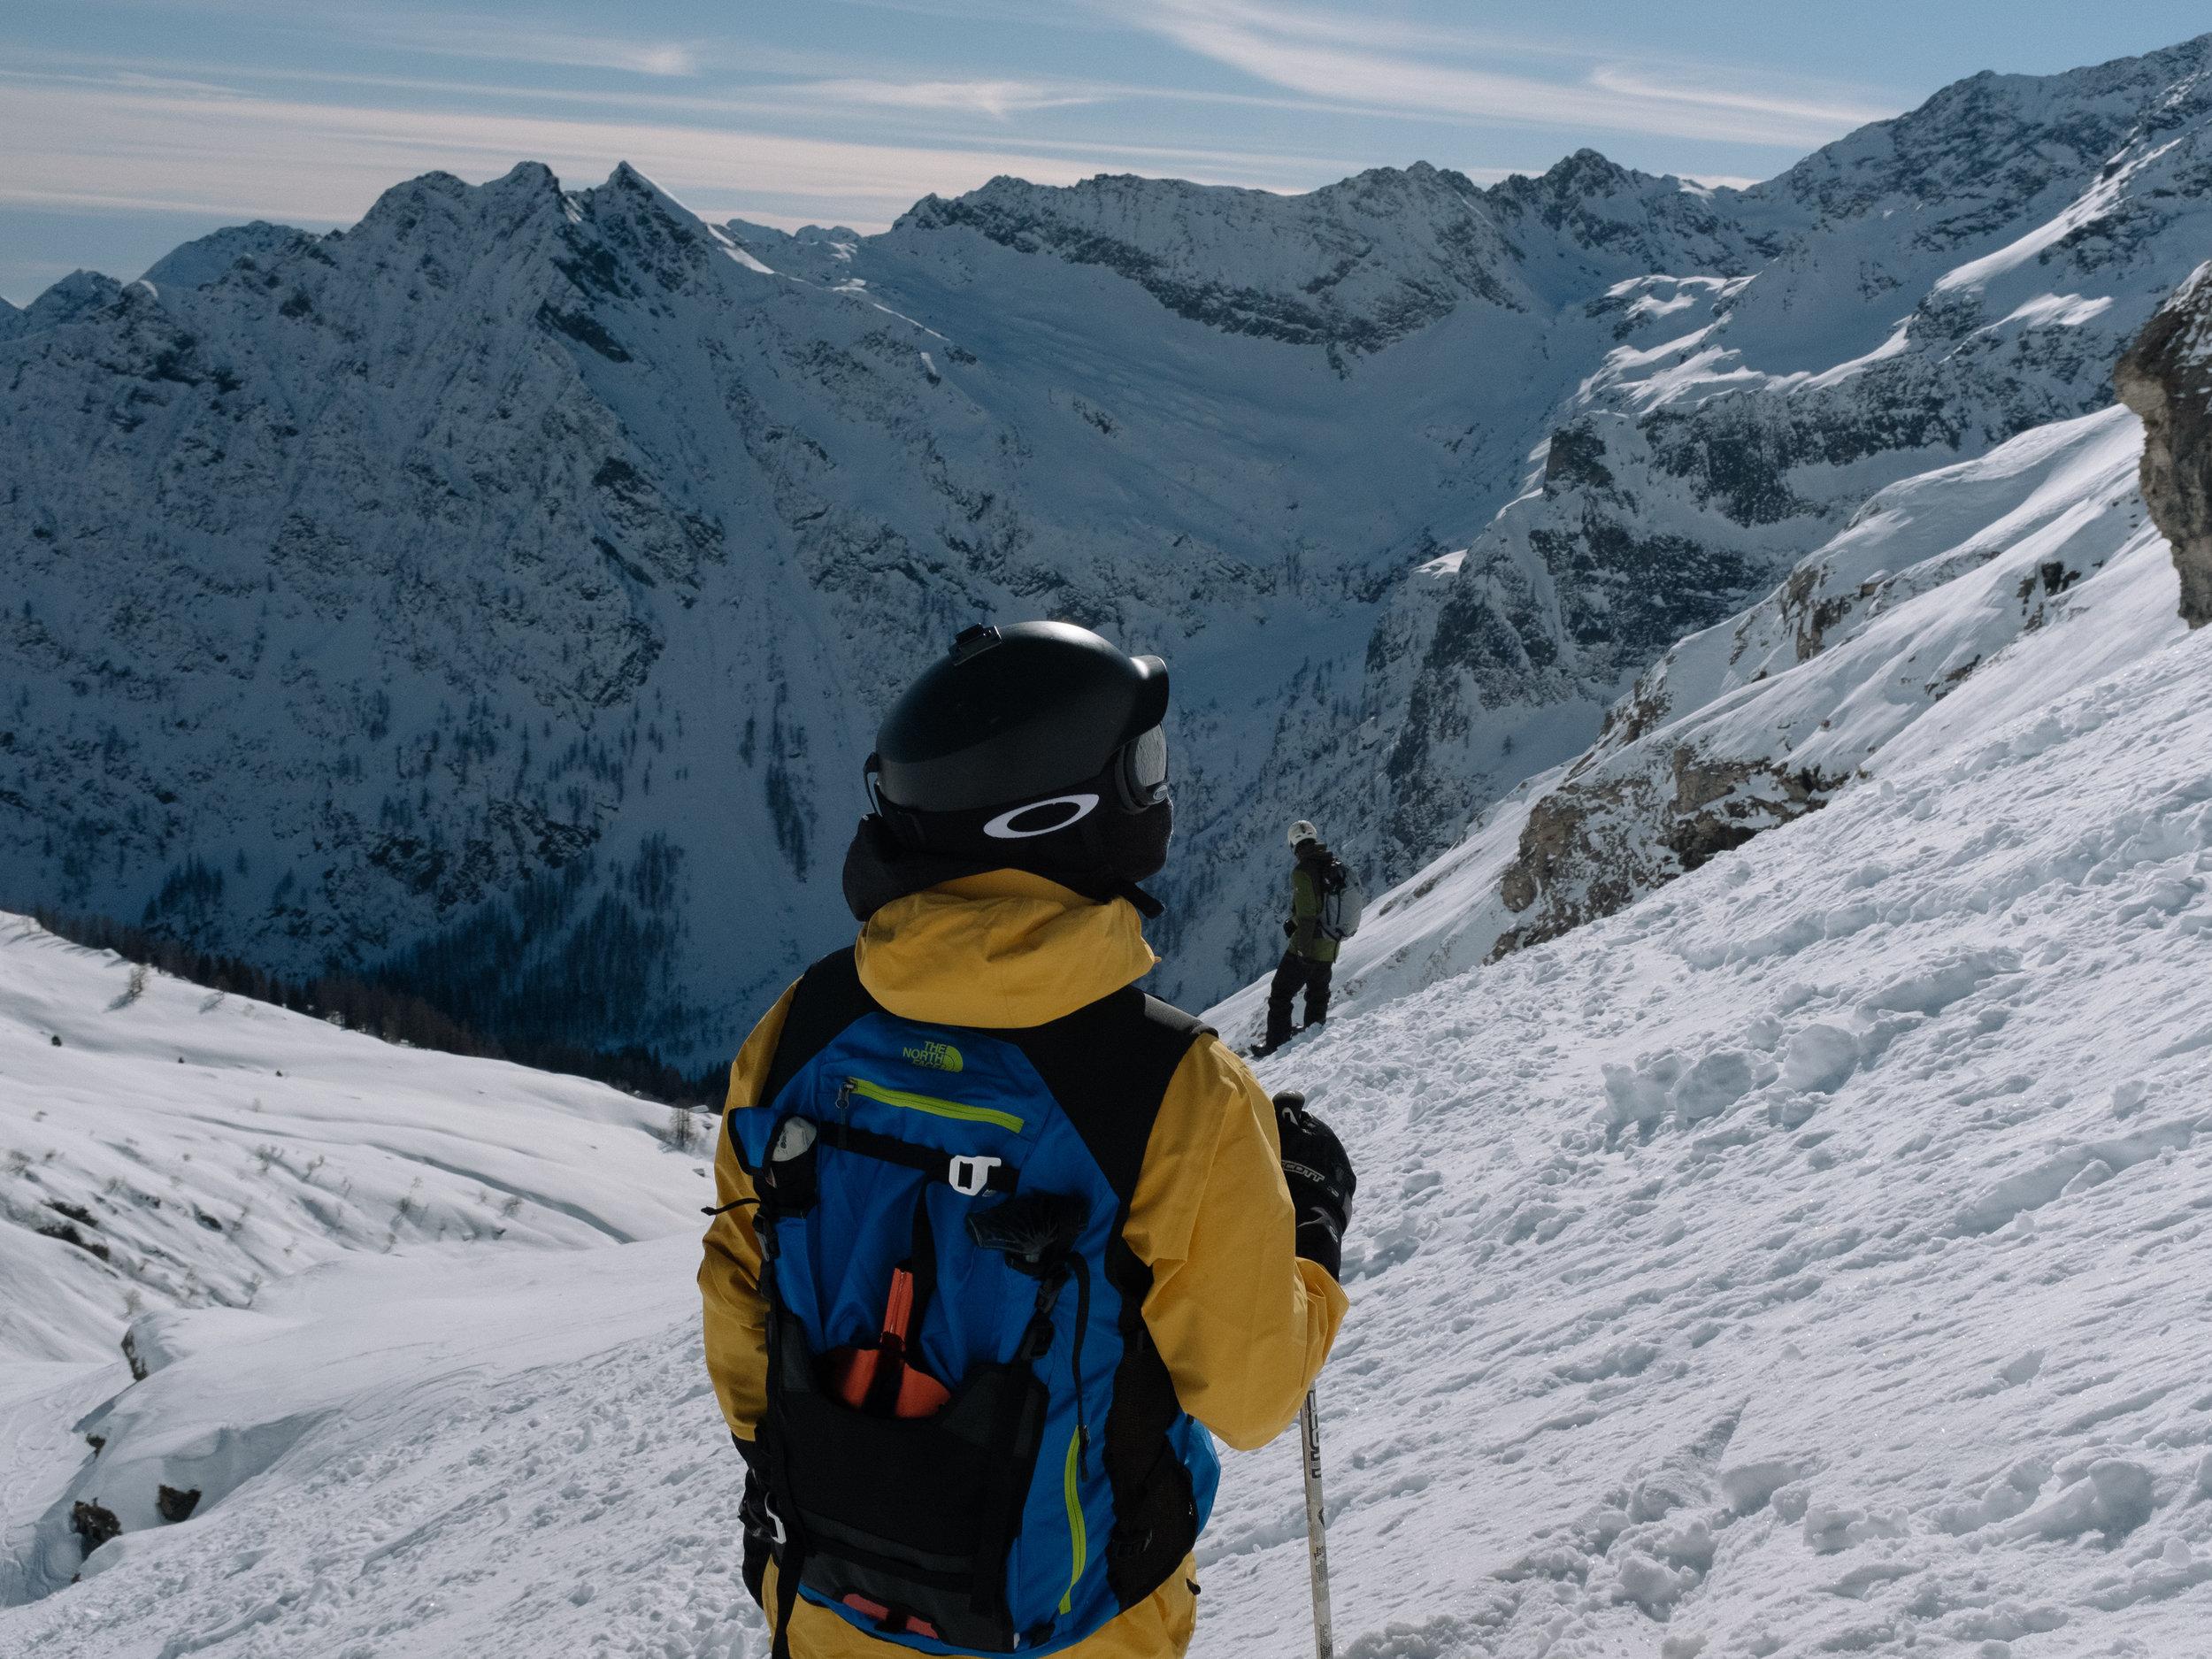 BenReadPhotography_Skiing_Alagna-4.jpg